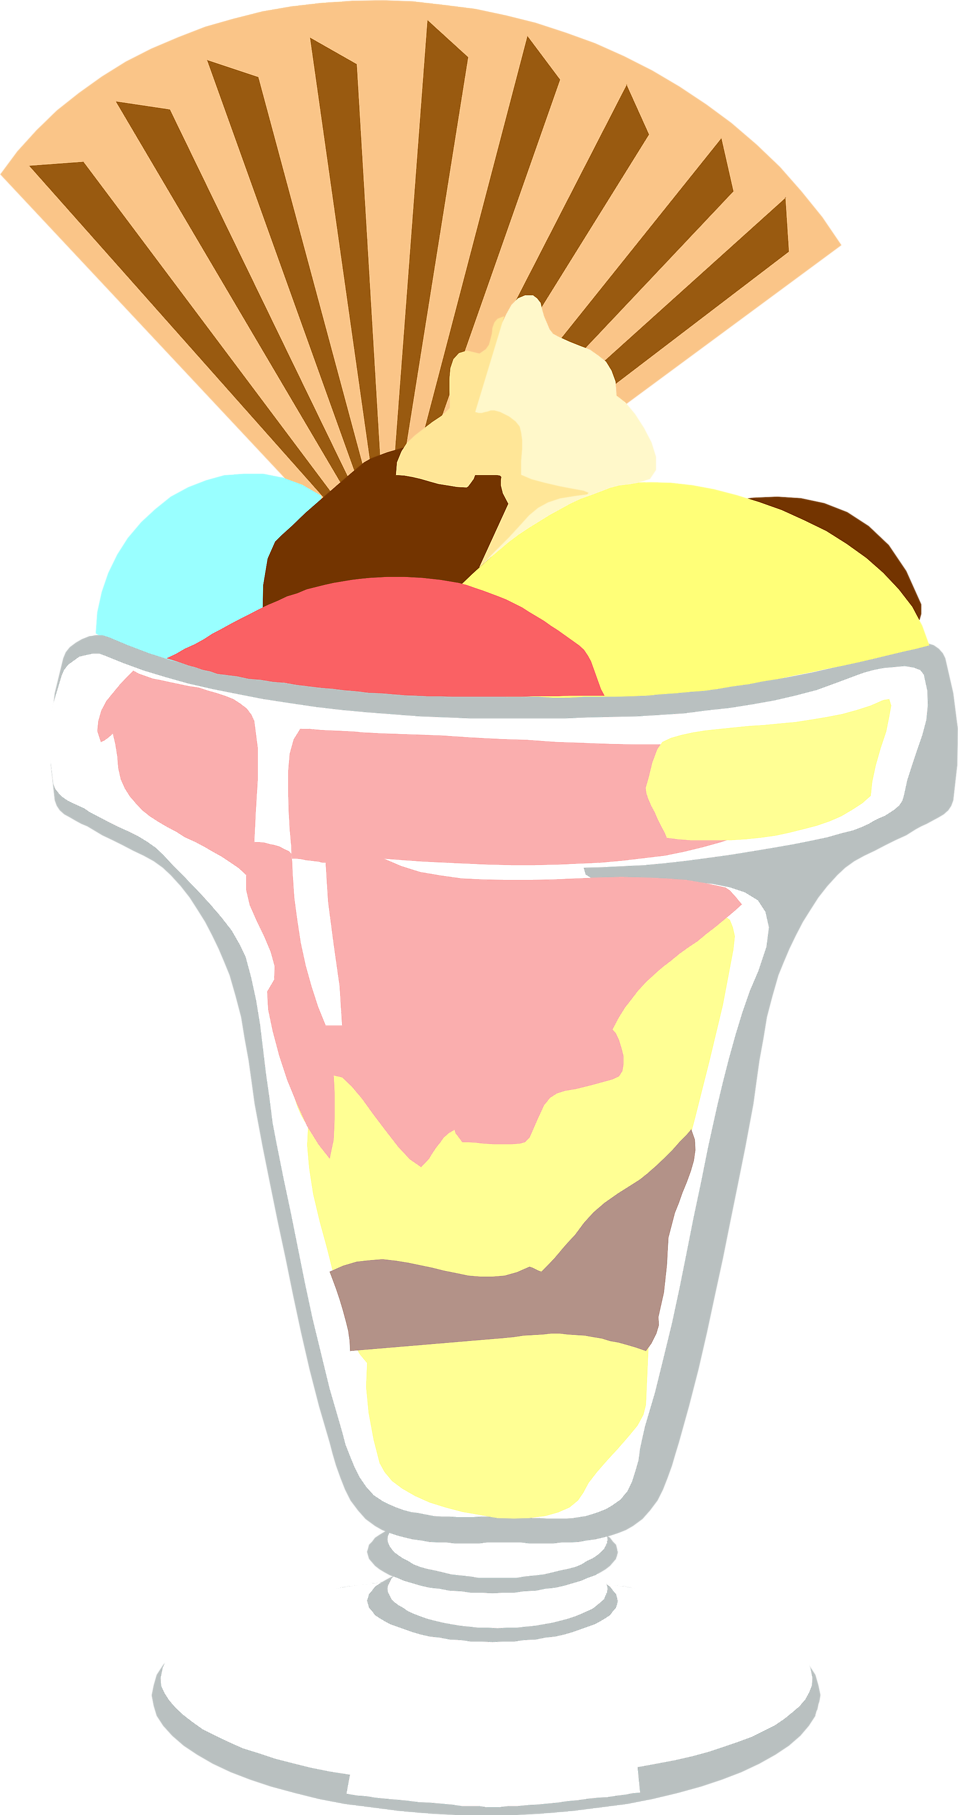 jpg Free stock photo illustration. Sundae clipart gelato italian